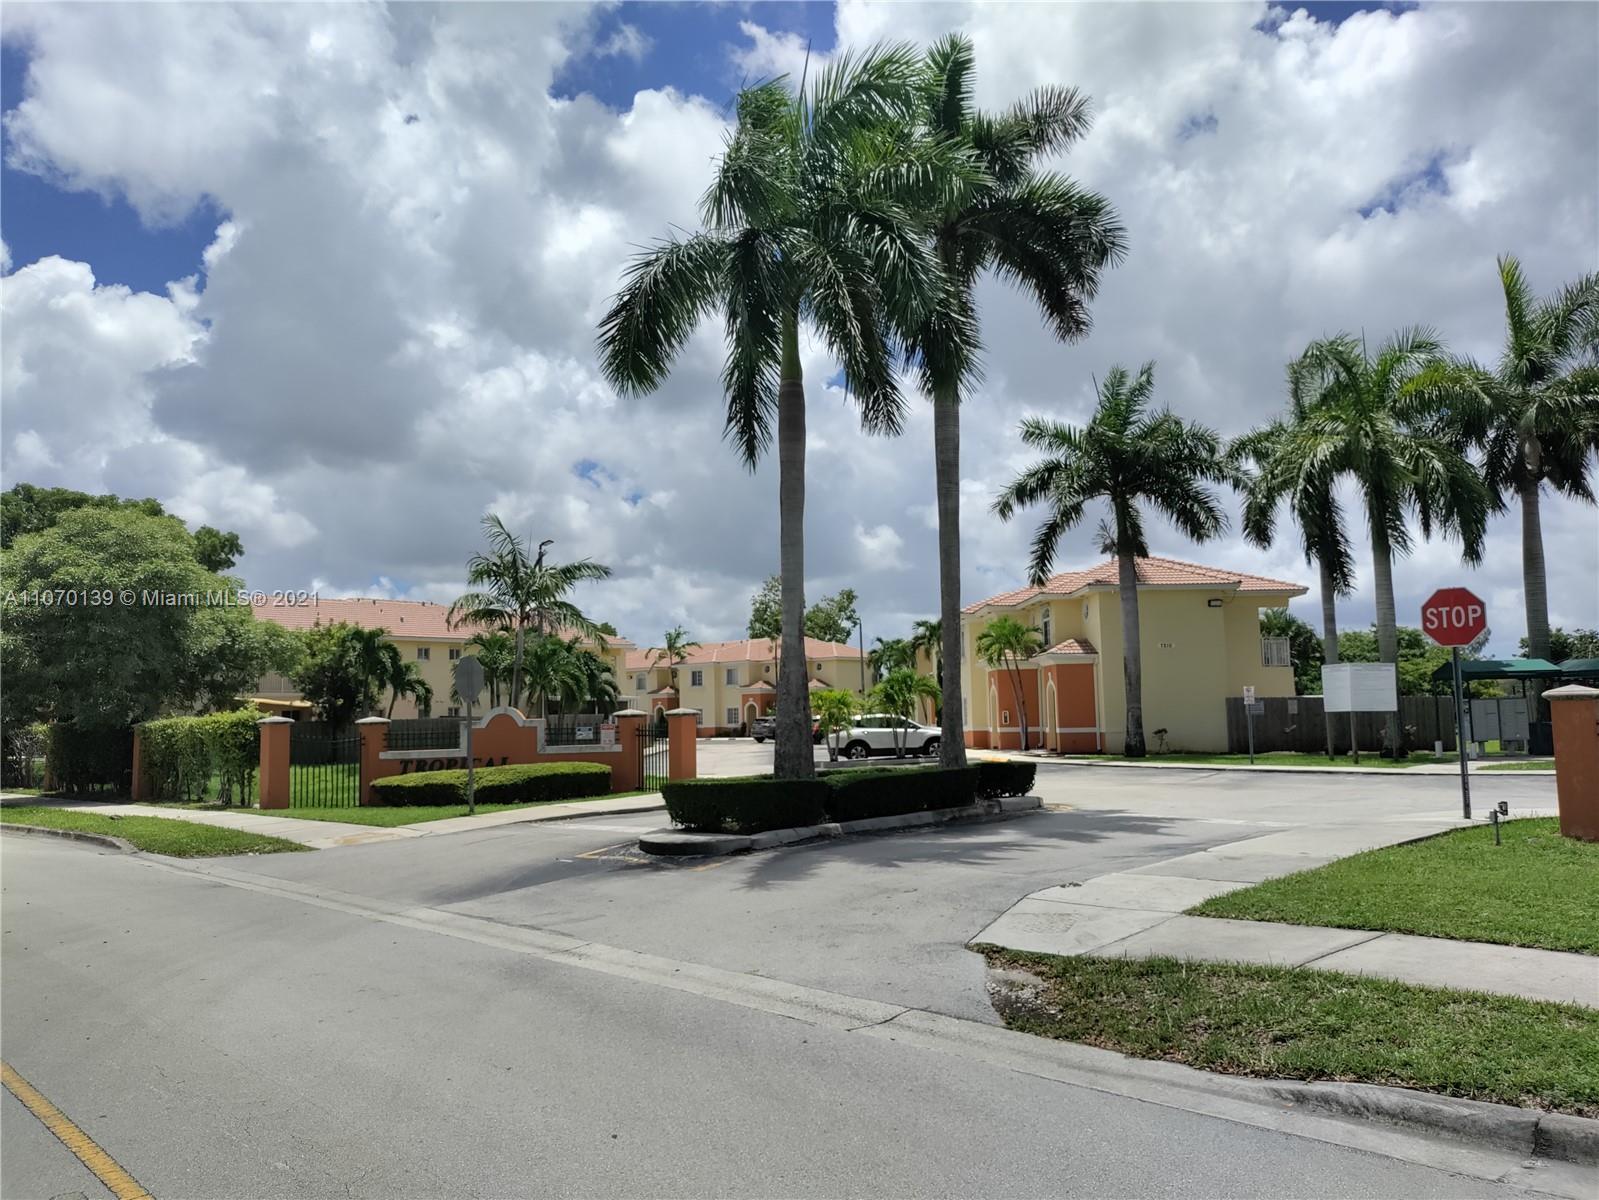 7160 174th Ter Unit 202, Hialeah, Florida 33015